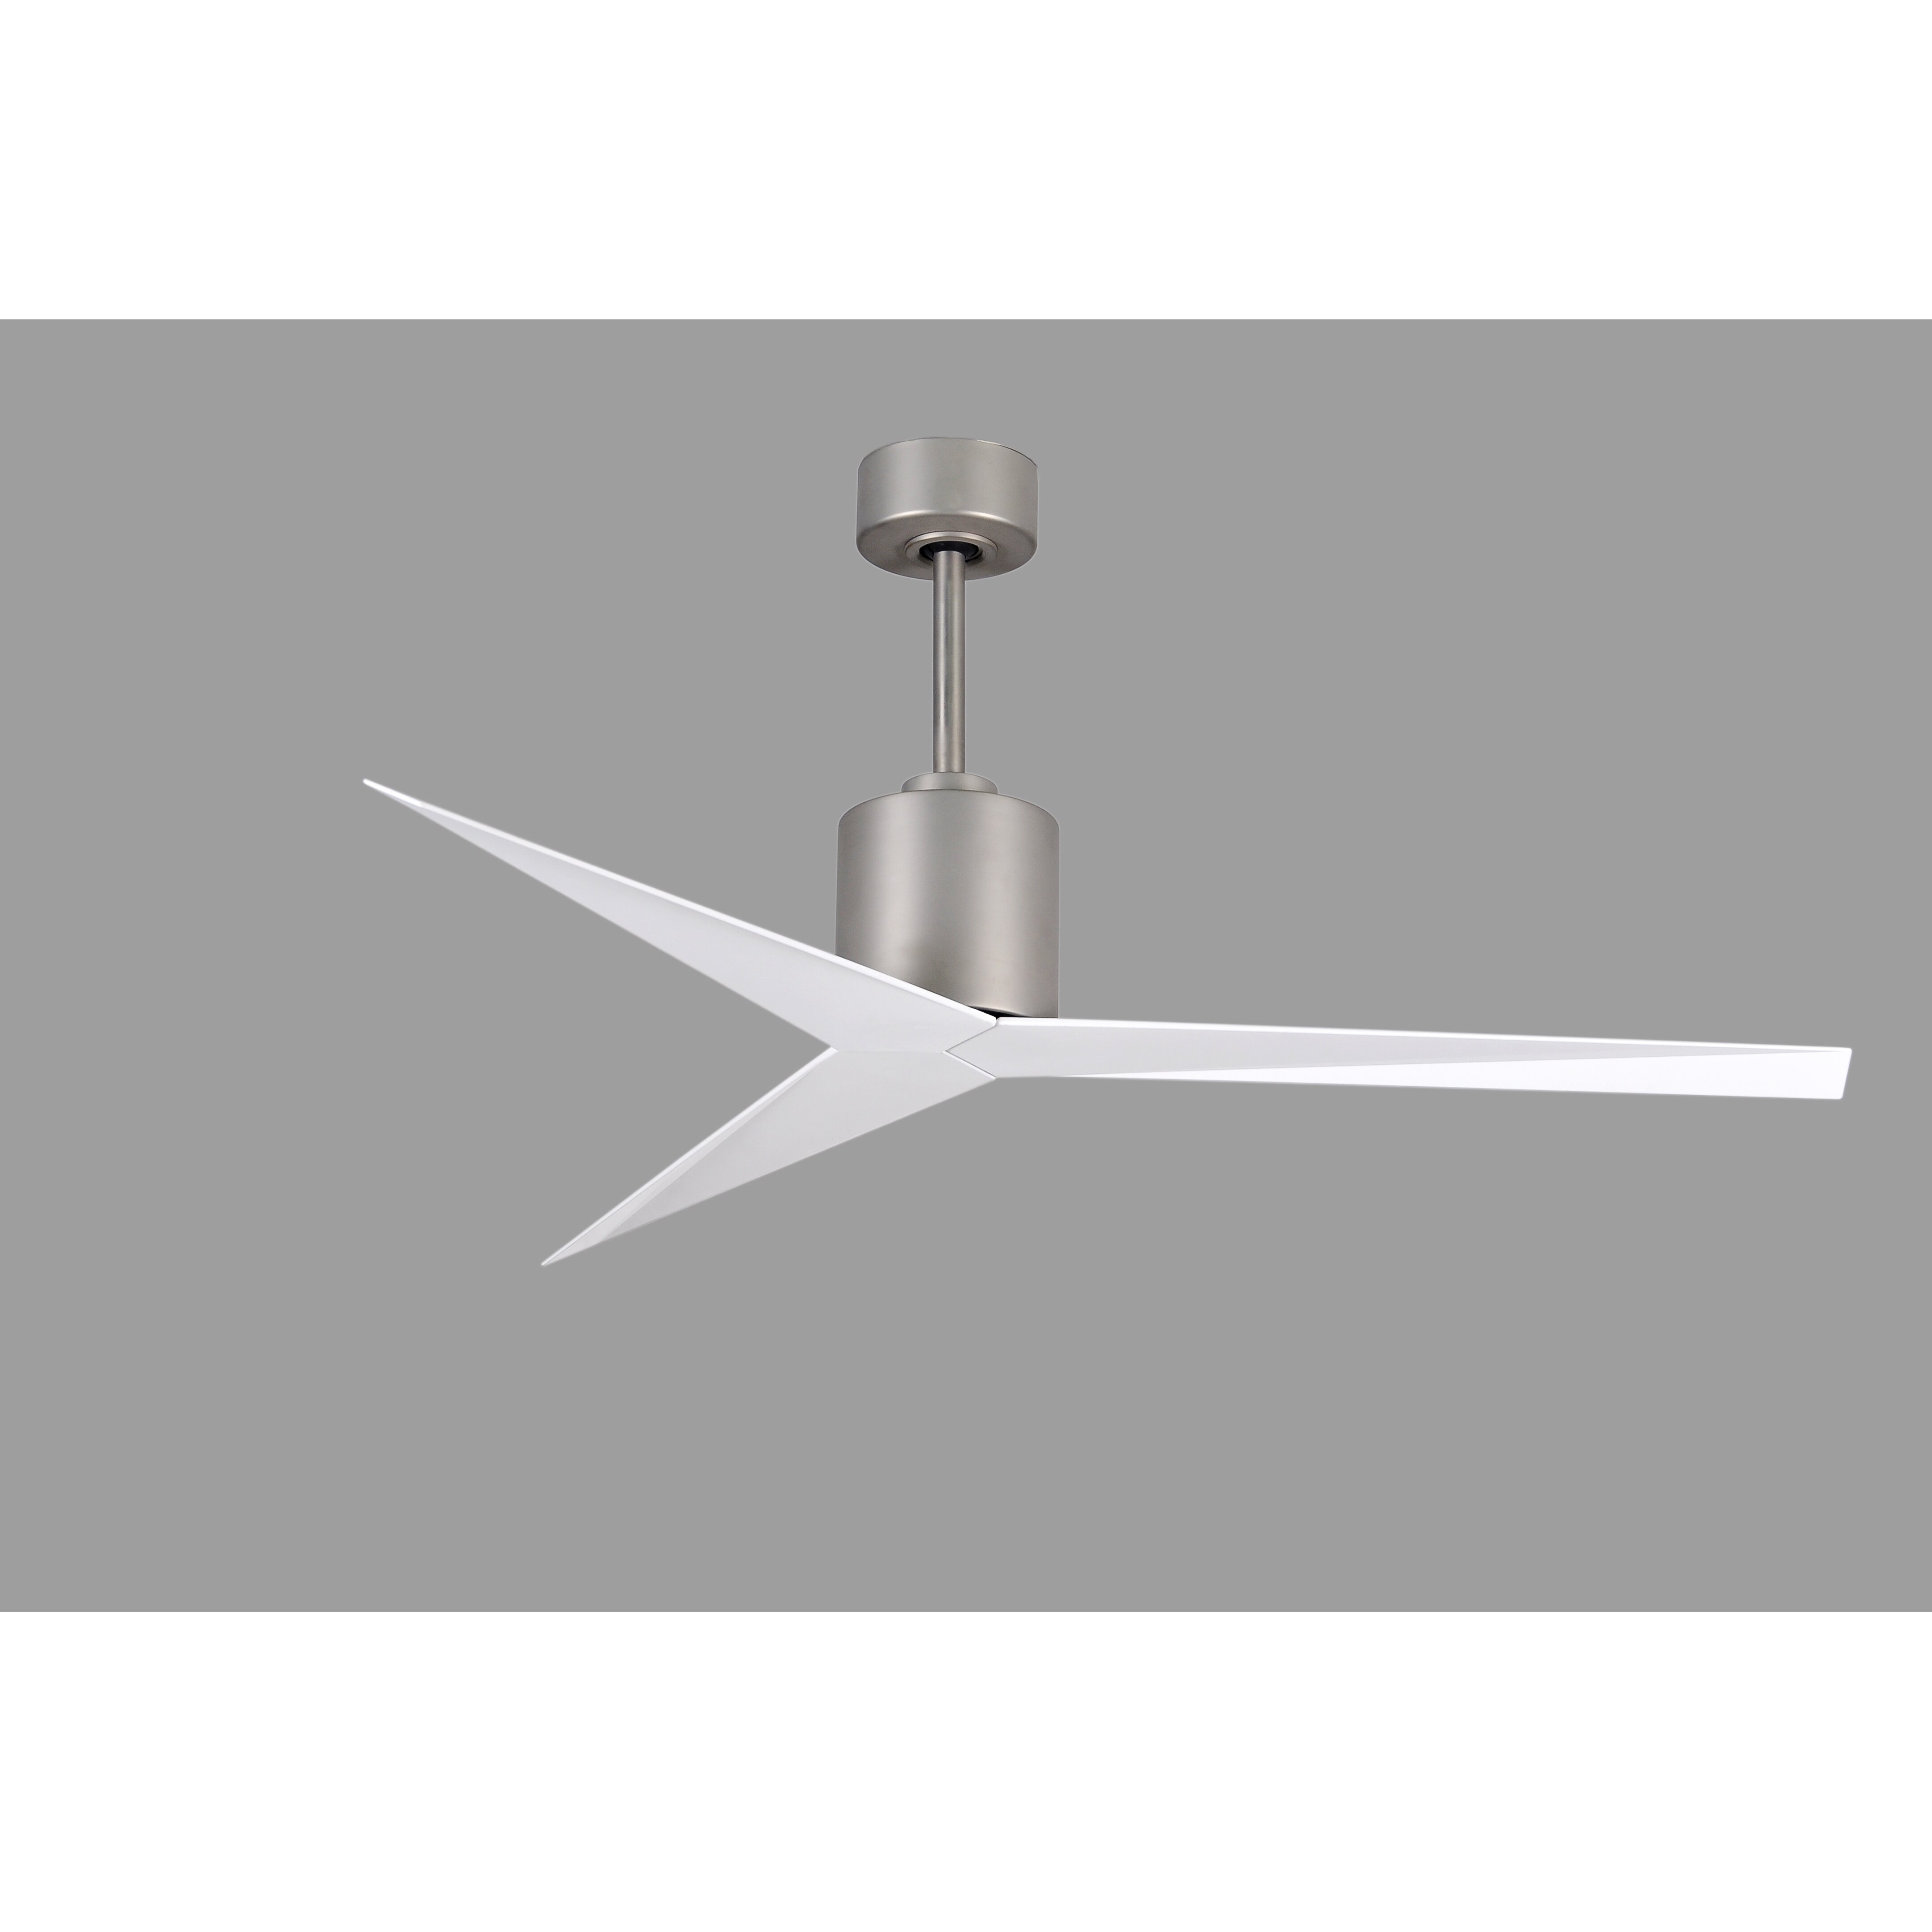 matthews fan company 56 eliza 3 blade ceiling fan with. Black Bedroom Furniture Sets. Home Design Ideas